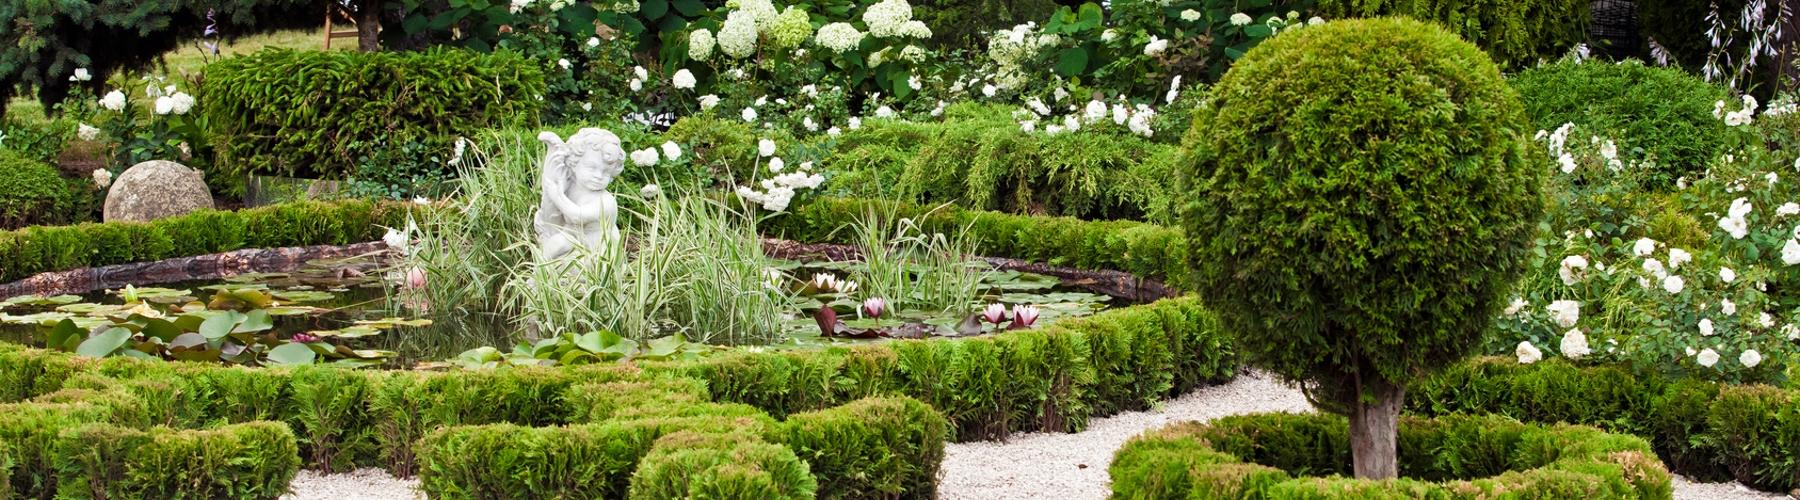 Garden Landscaping & Garden Landscapes | Hard \u0026 Soft Landscaping | High Wycombe Bucks